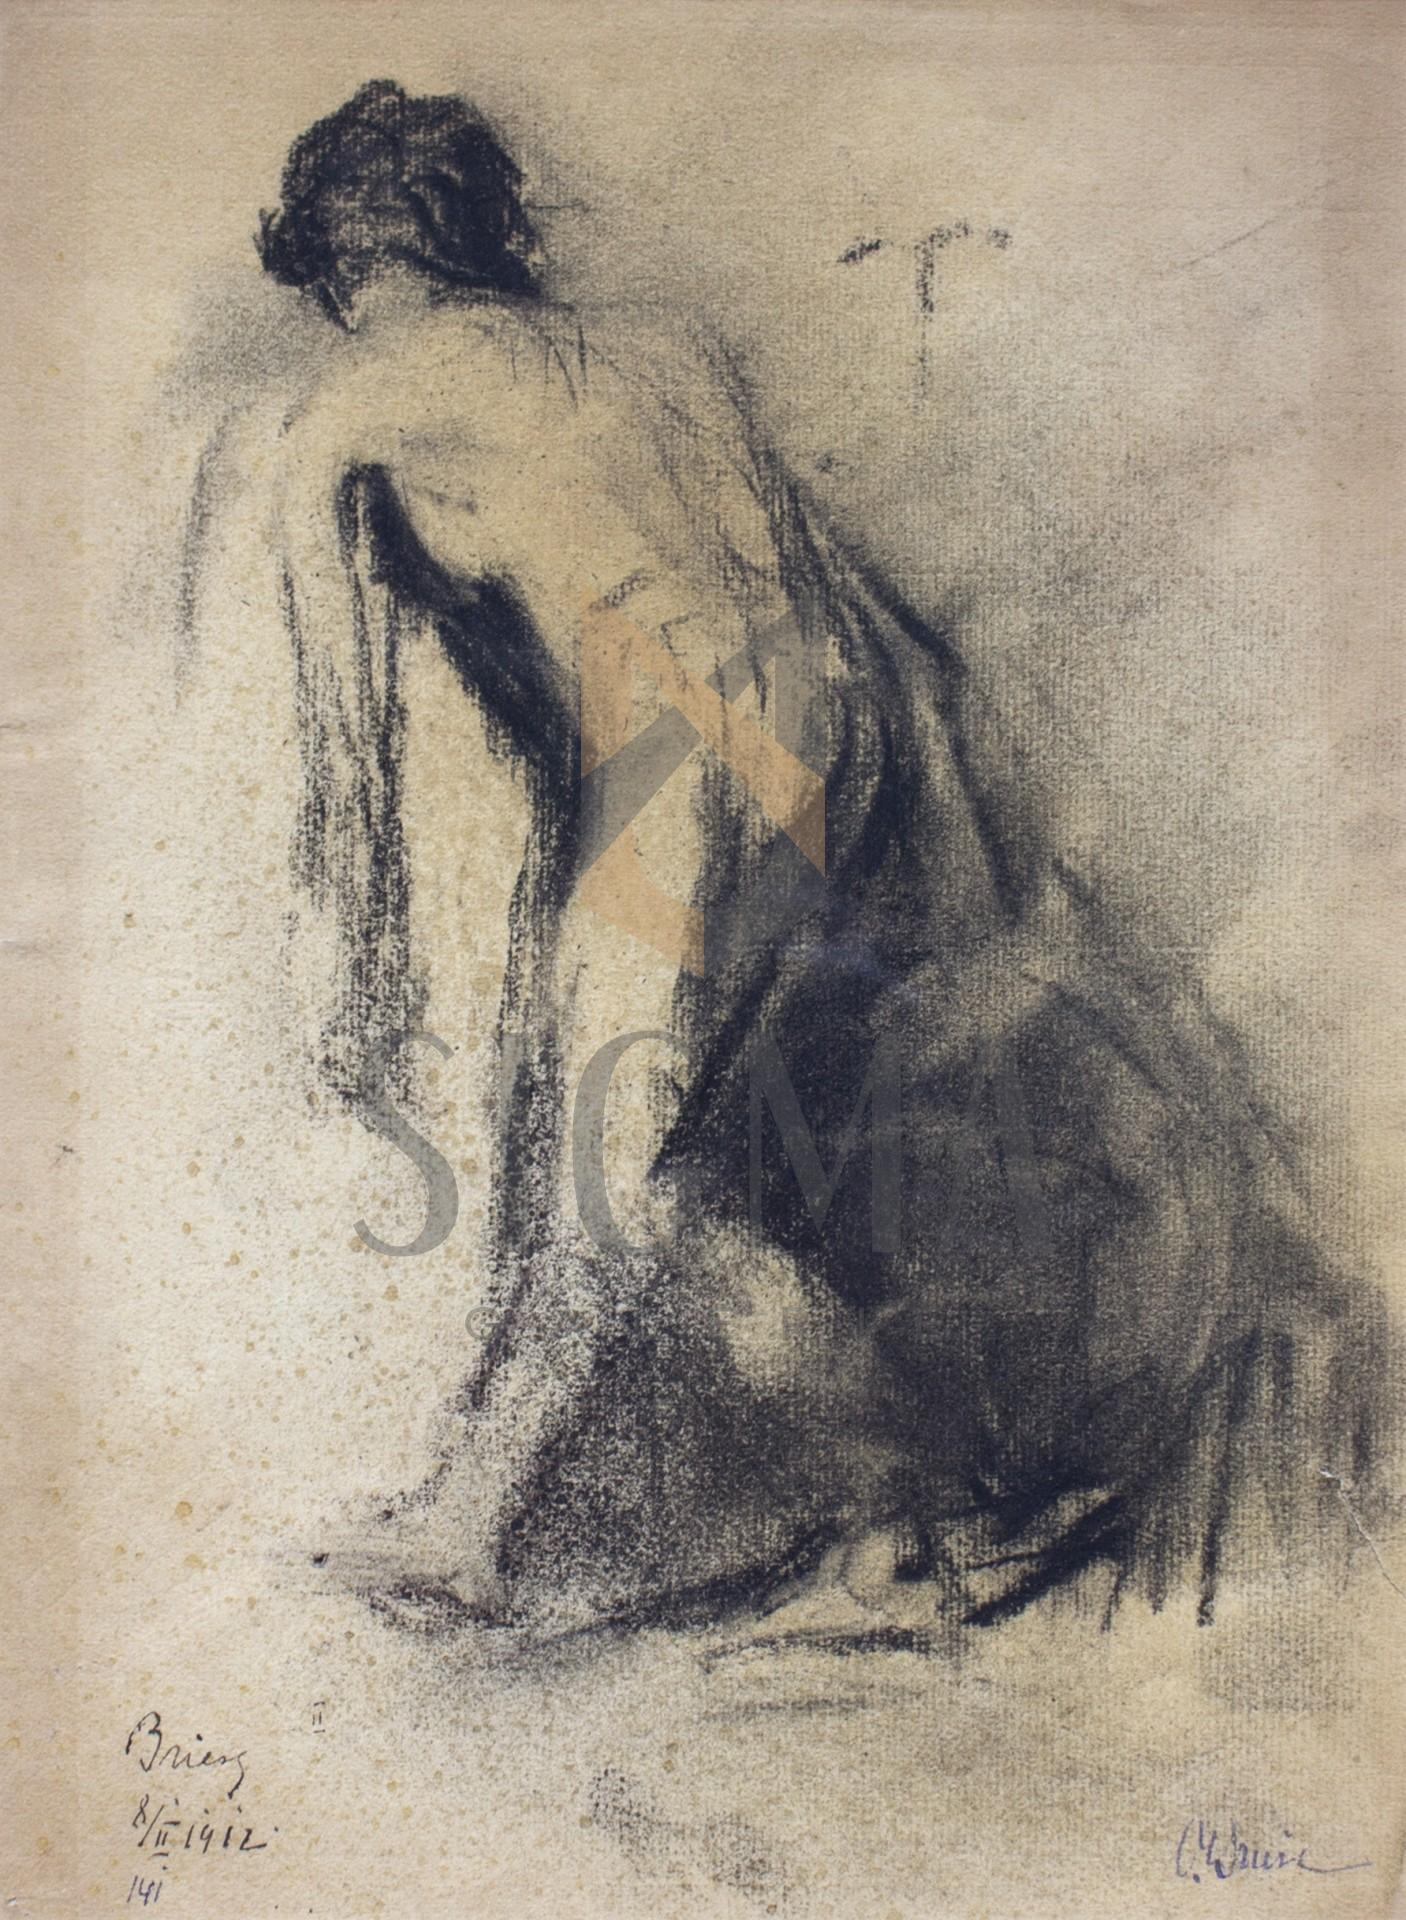 "Tablou OTTO BRIESE ""Studiu""  carbune pe hartie, 30 x 21 cm datat 1912, semnat dreapta jos Briese"